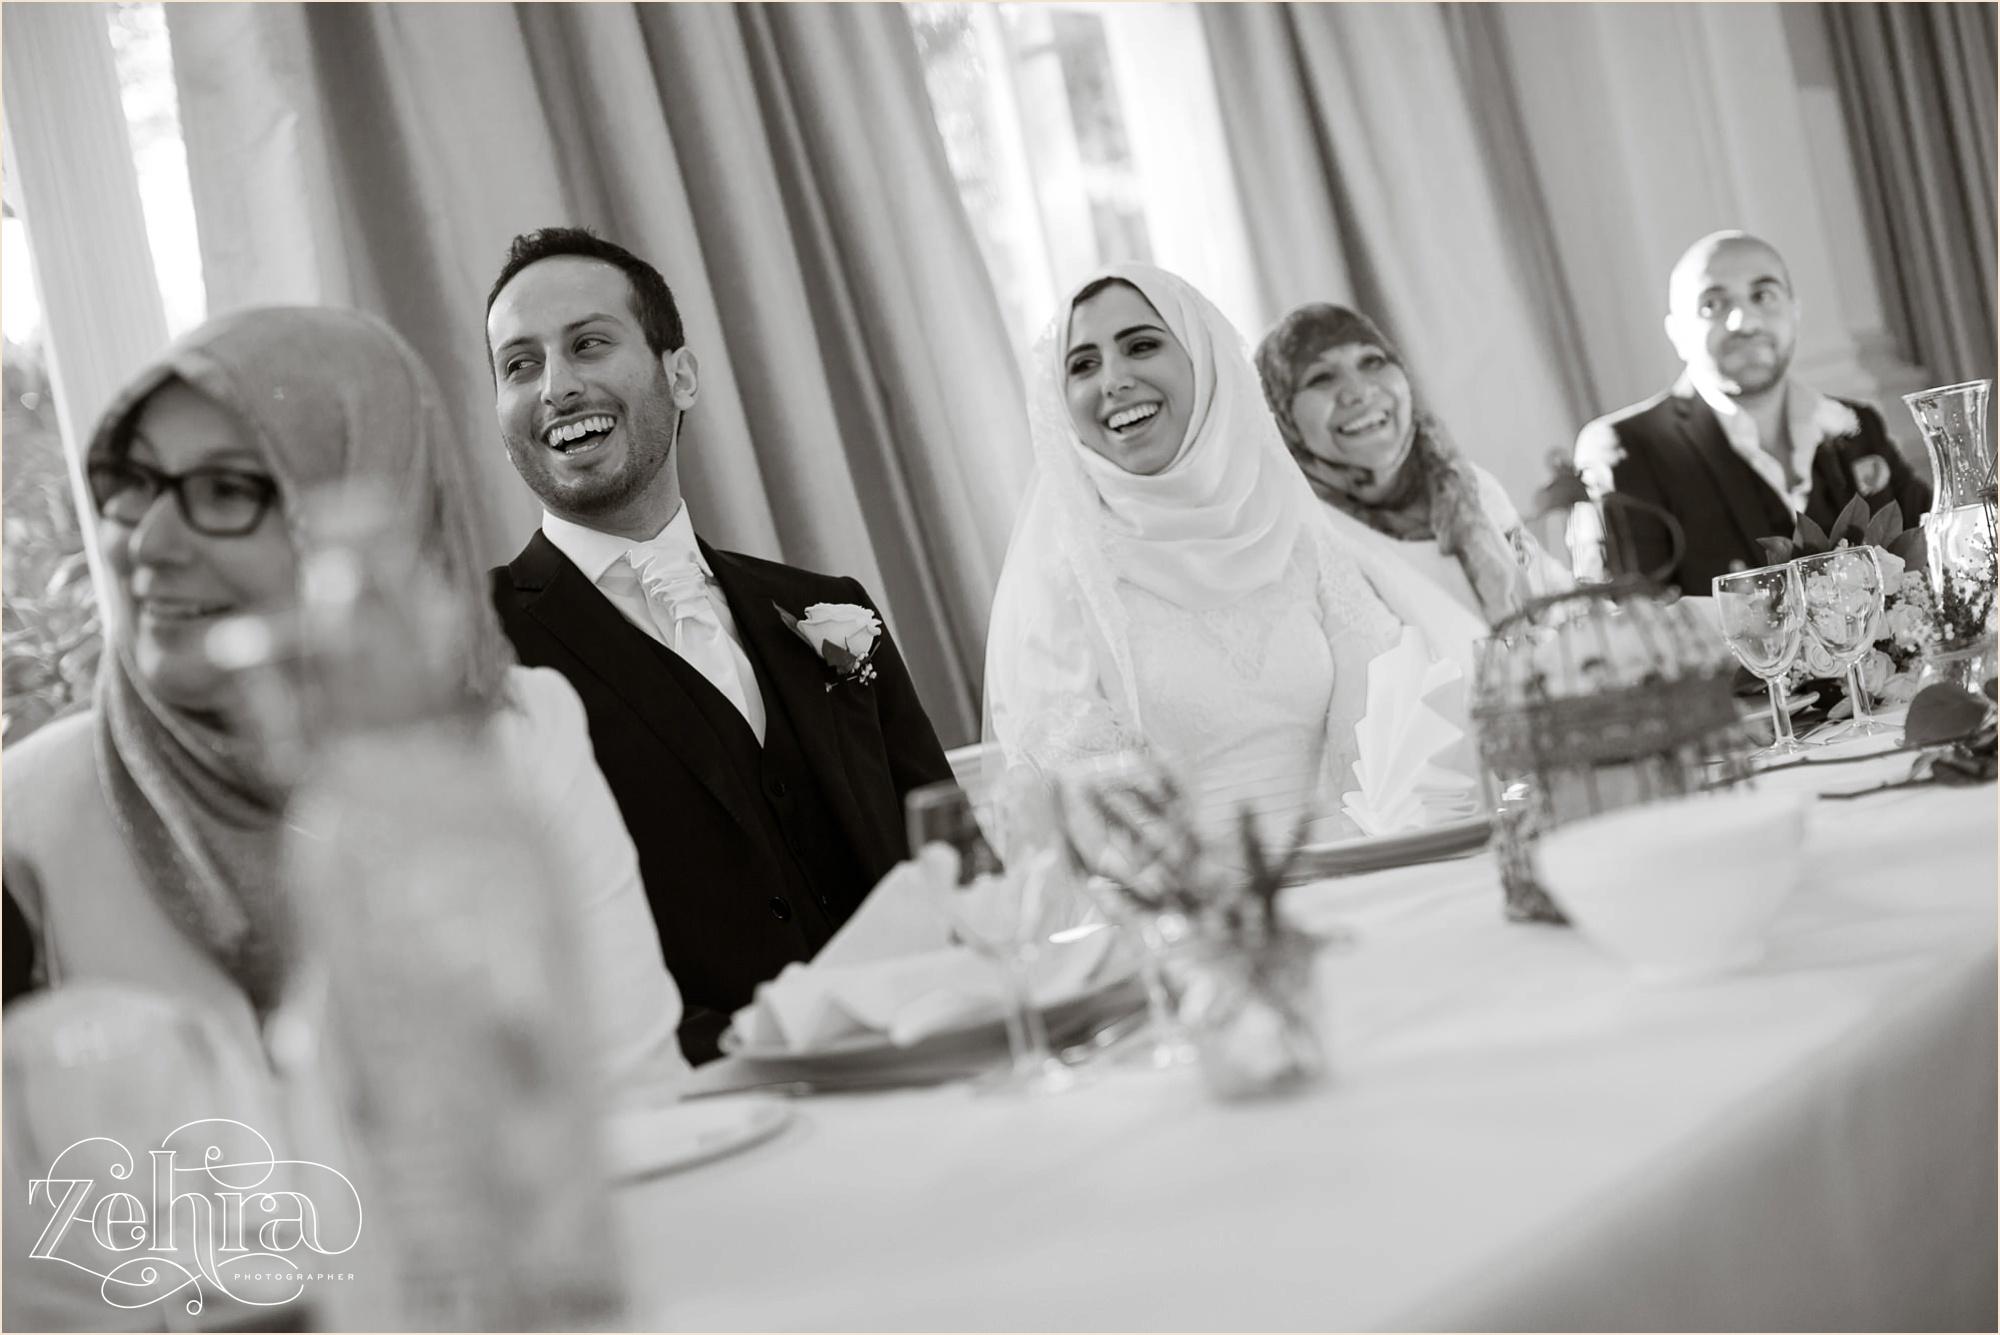 jasira manchester wedding photographer_0103.jpg